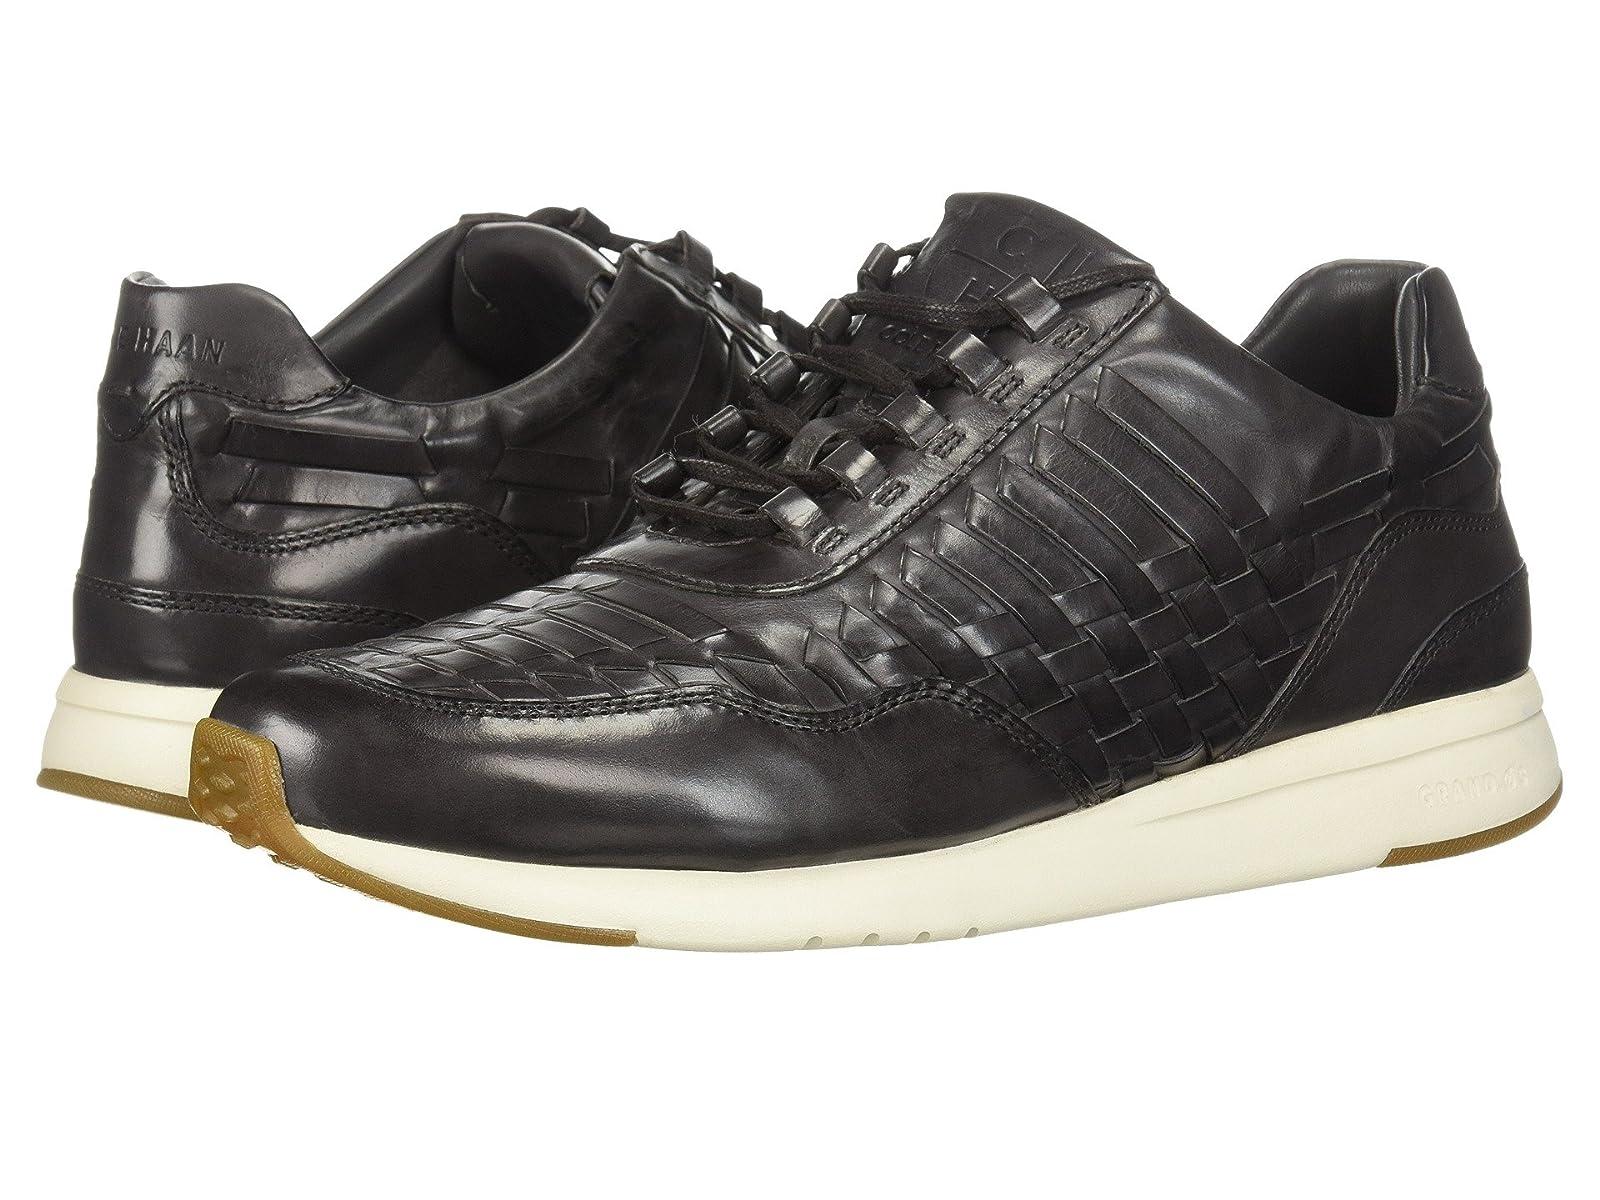 Cole Haan Grandpro Runner HuaracheCheap and distinctive eye-catching shoes